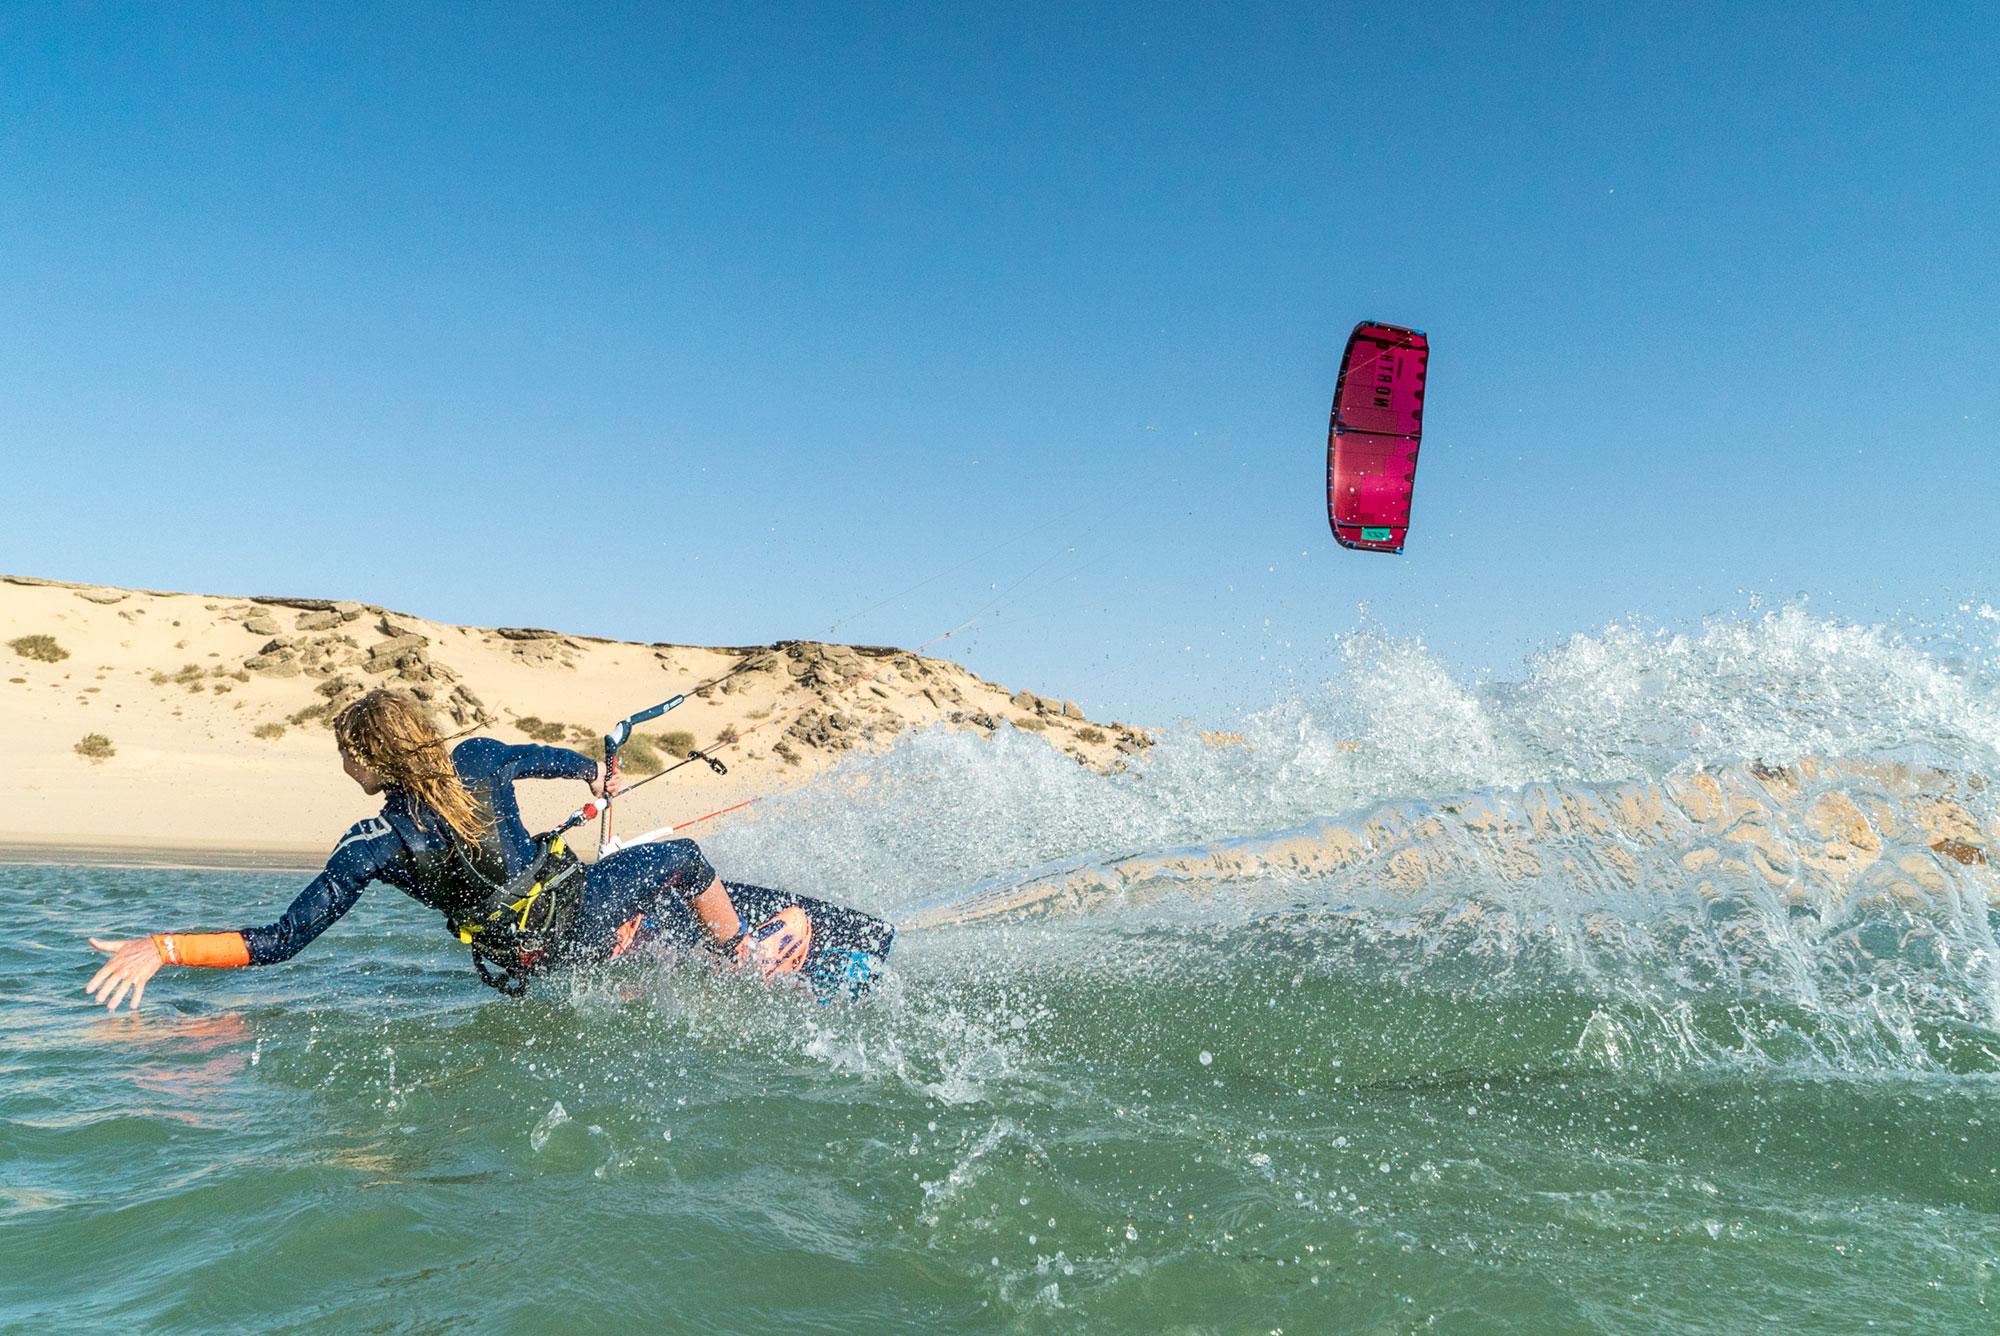 Run-fast-run-free-kitesurfing-fun-and-happiness.jpg